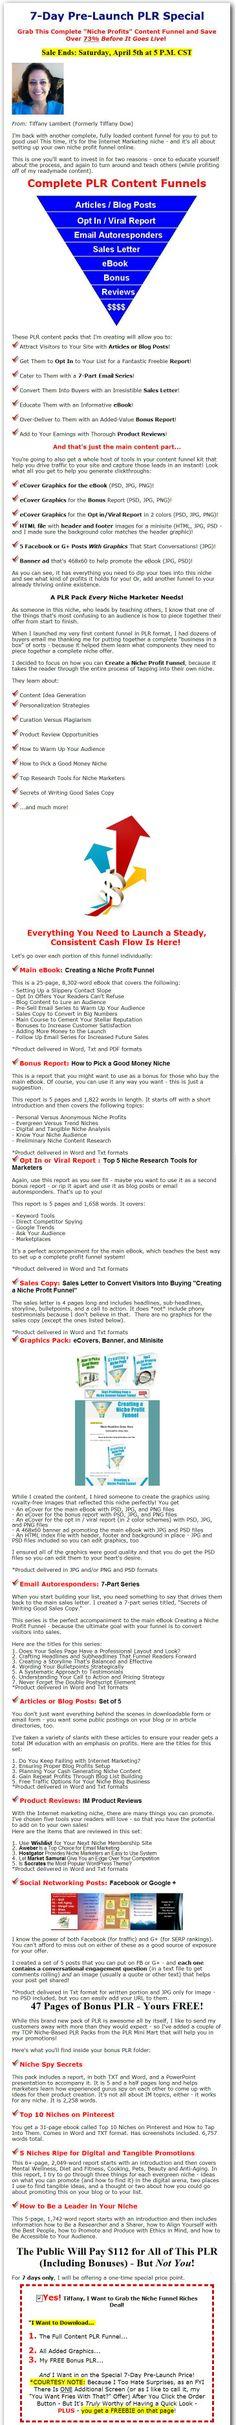 7 Day Pre Launch Niche Funnel Riches PLR Bundle - One Trade Store http://jvz7.com/c/98971/95565